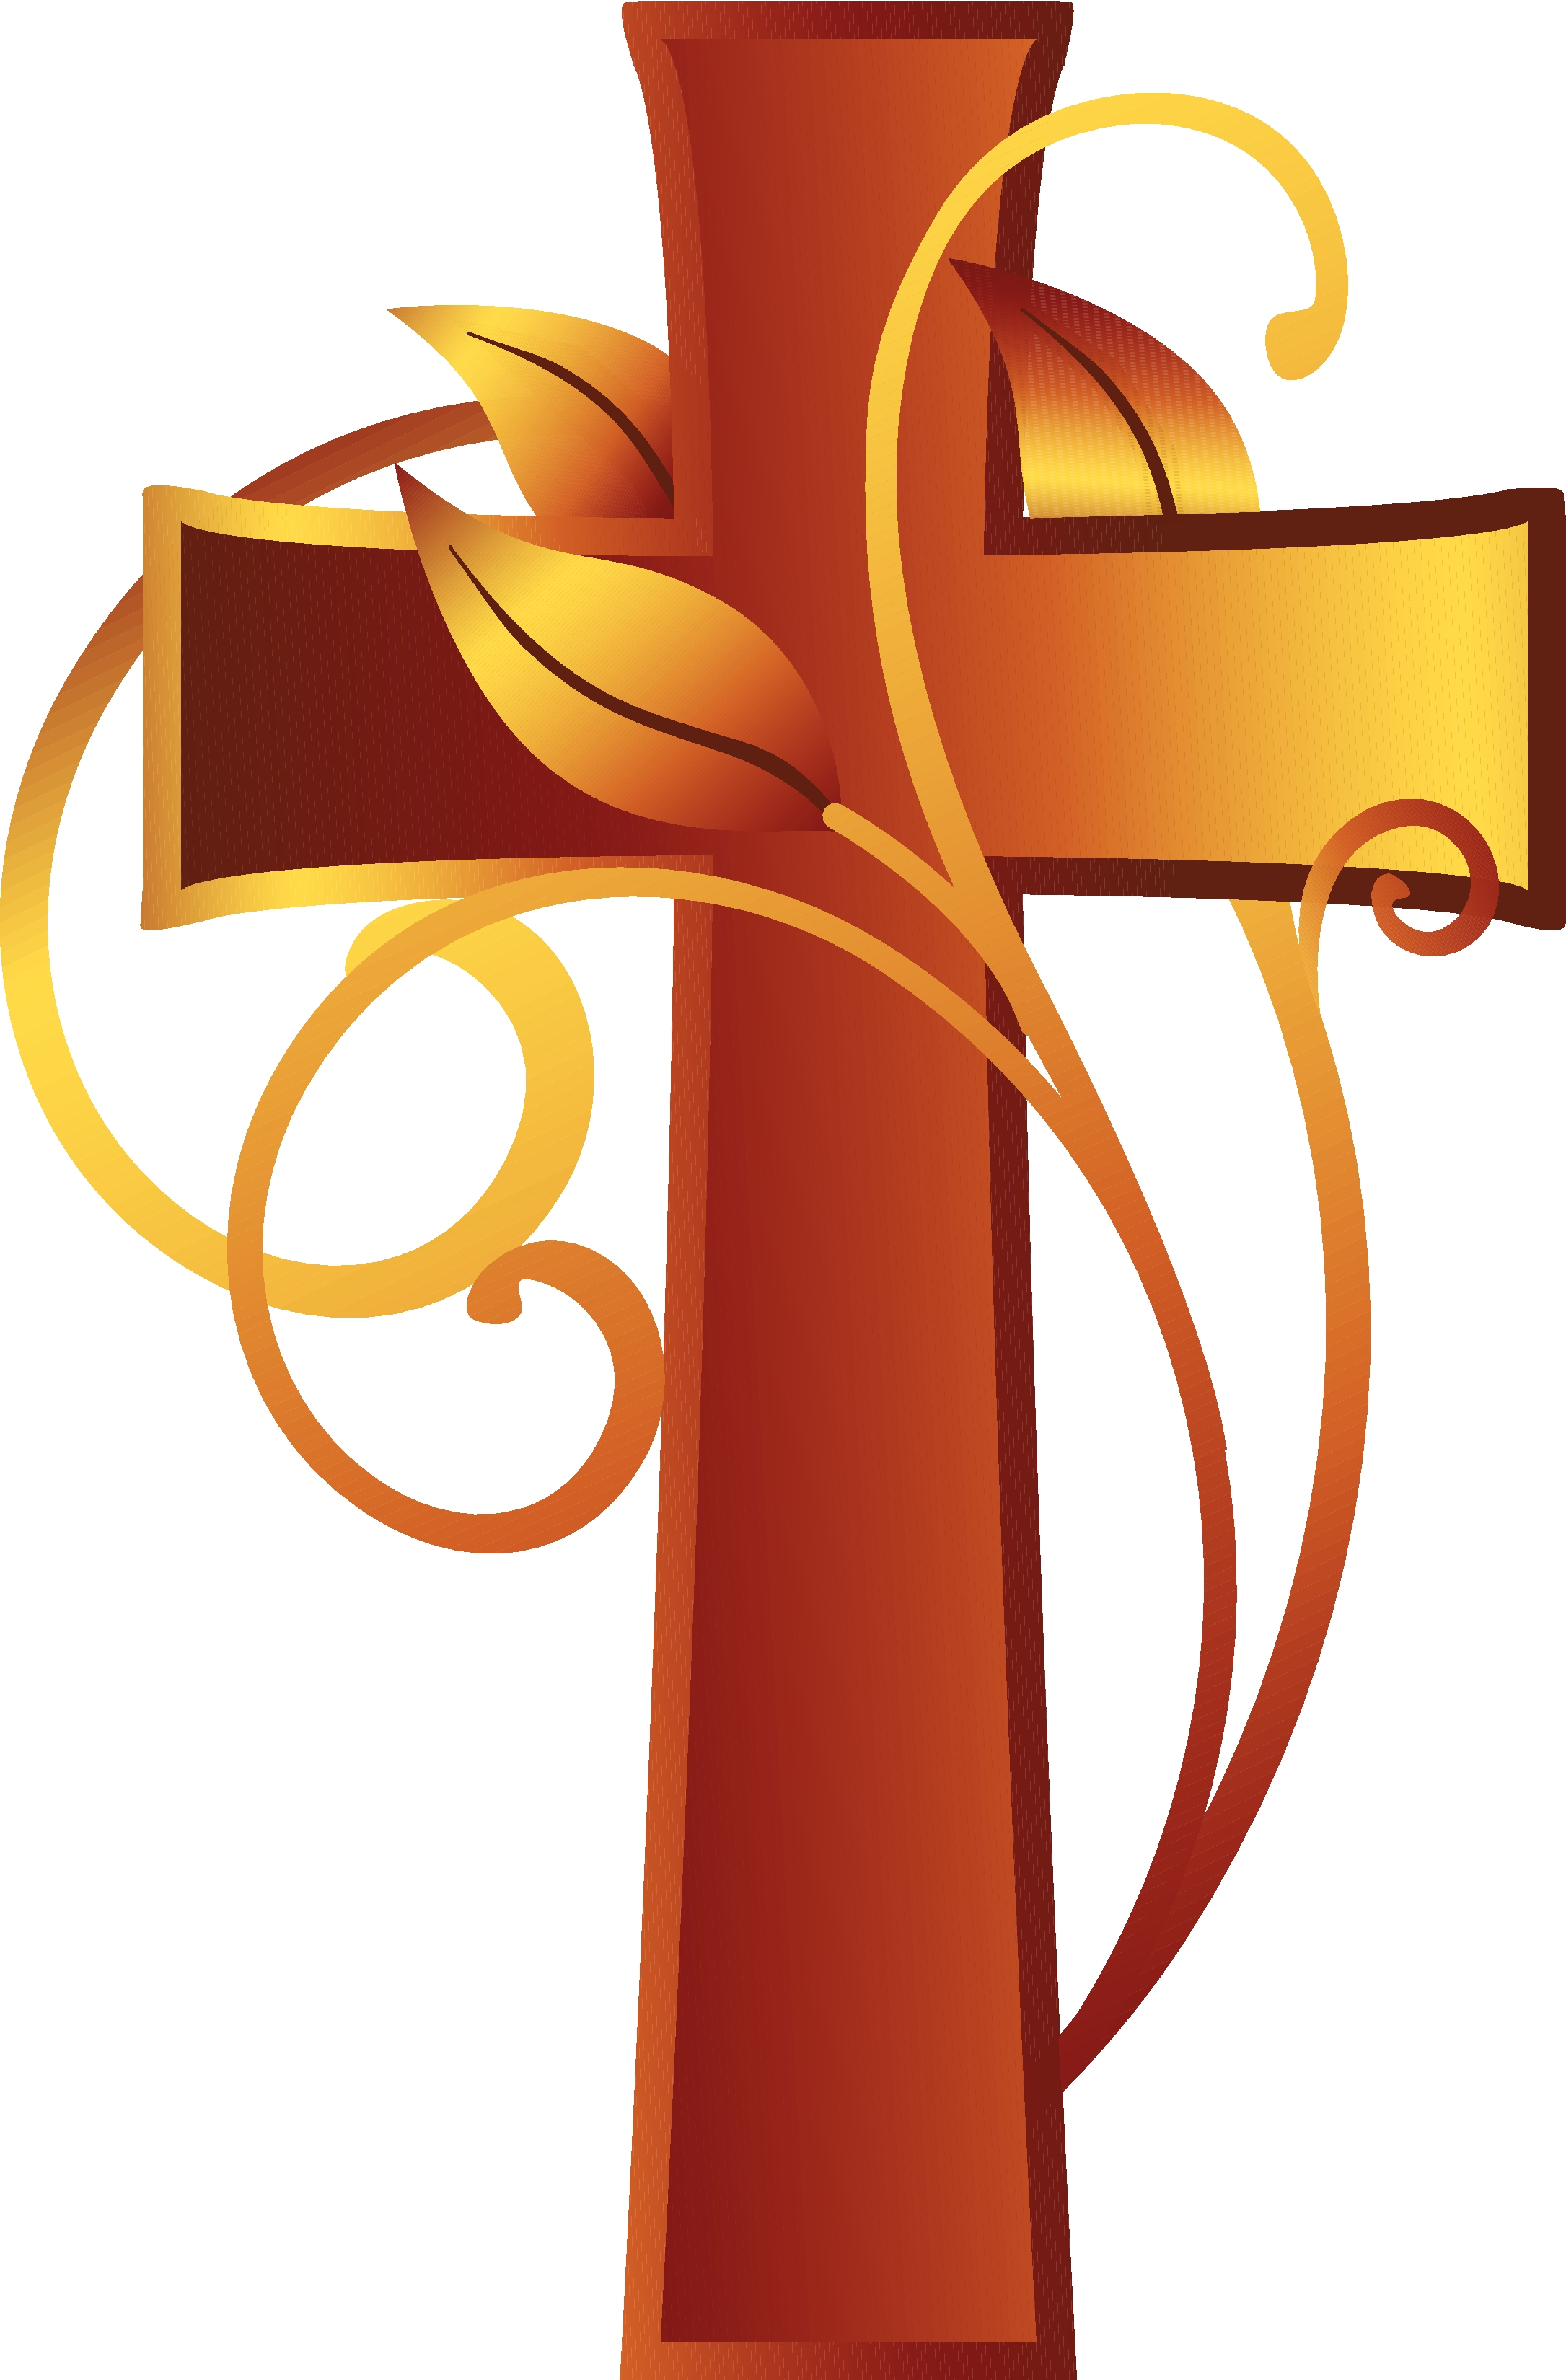 Cross Clipart Cross Clip Art .-Cross clipart cross clip art .-12